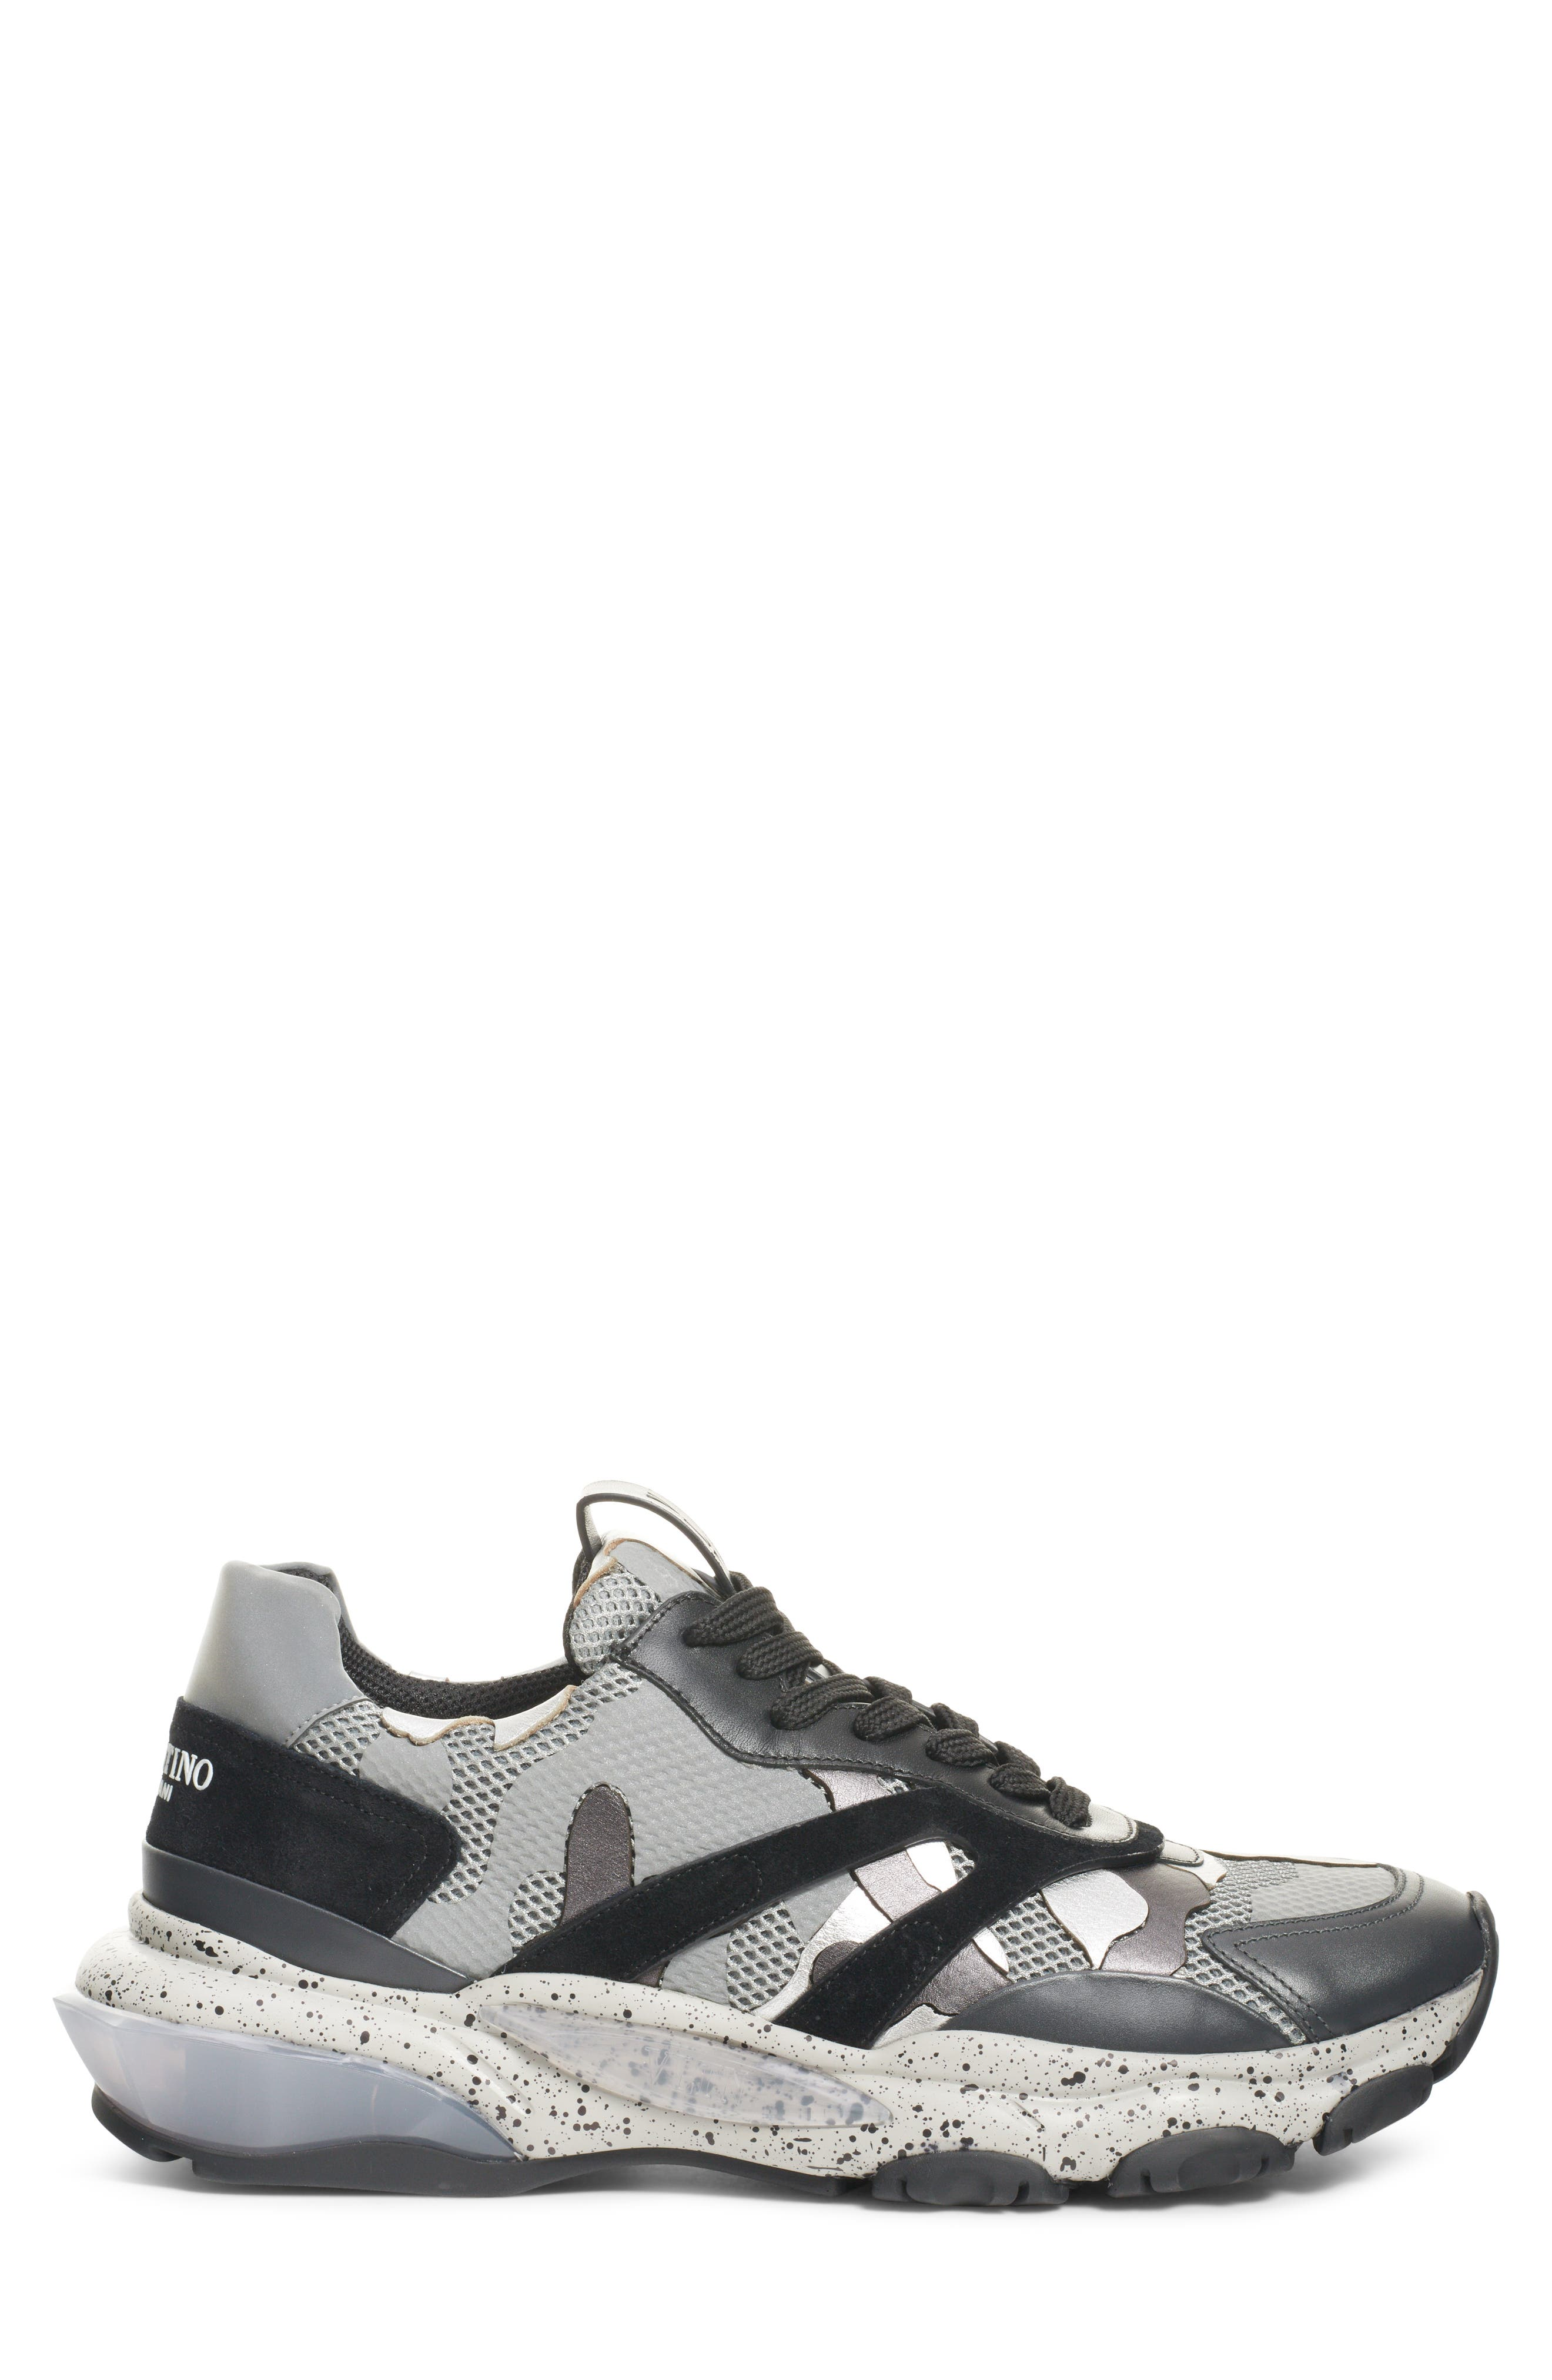 Bounce Sneaker,                             Alternate thumbnail 3, color,                             DARK SILVER/ BLACK